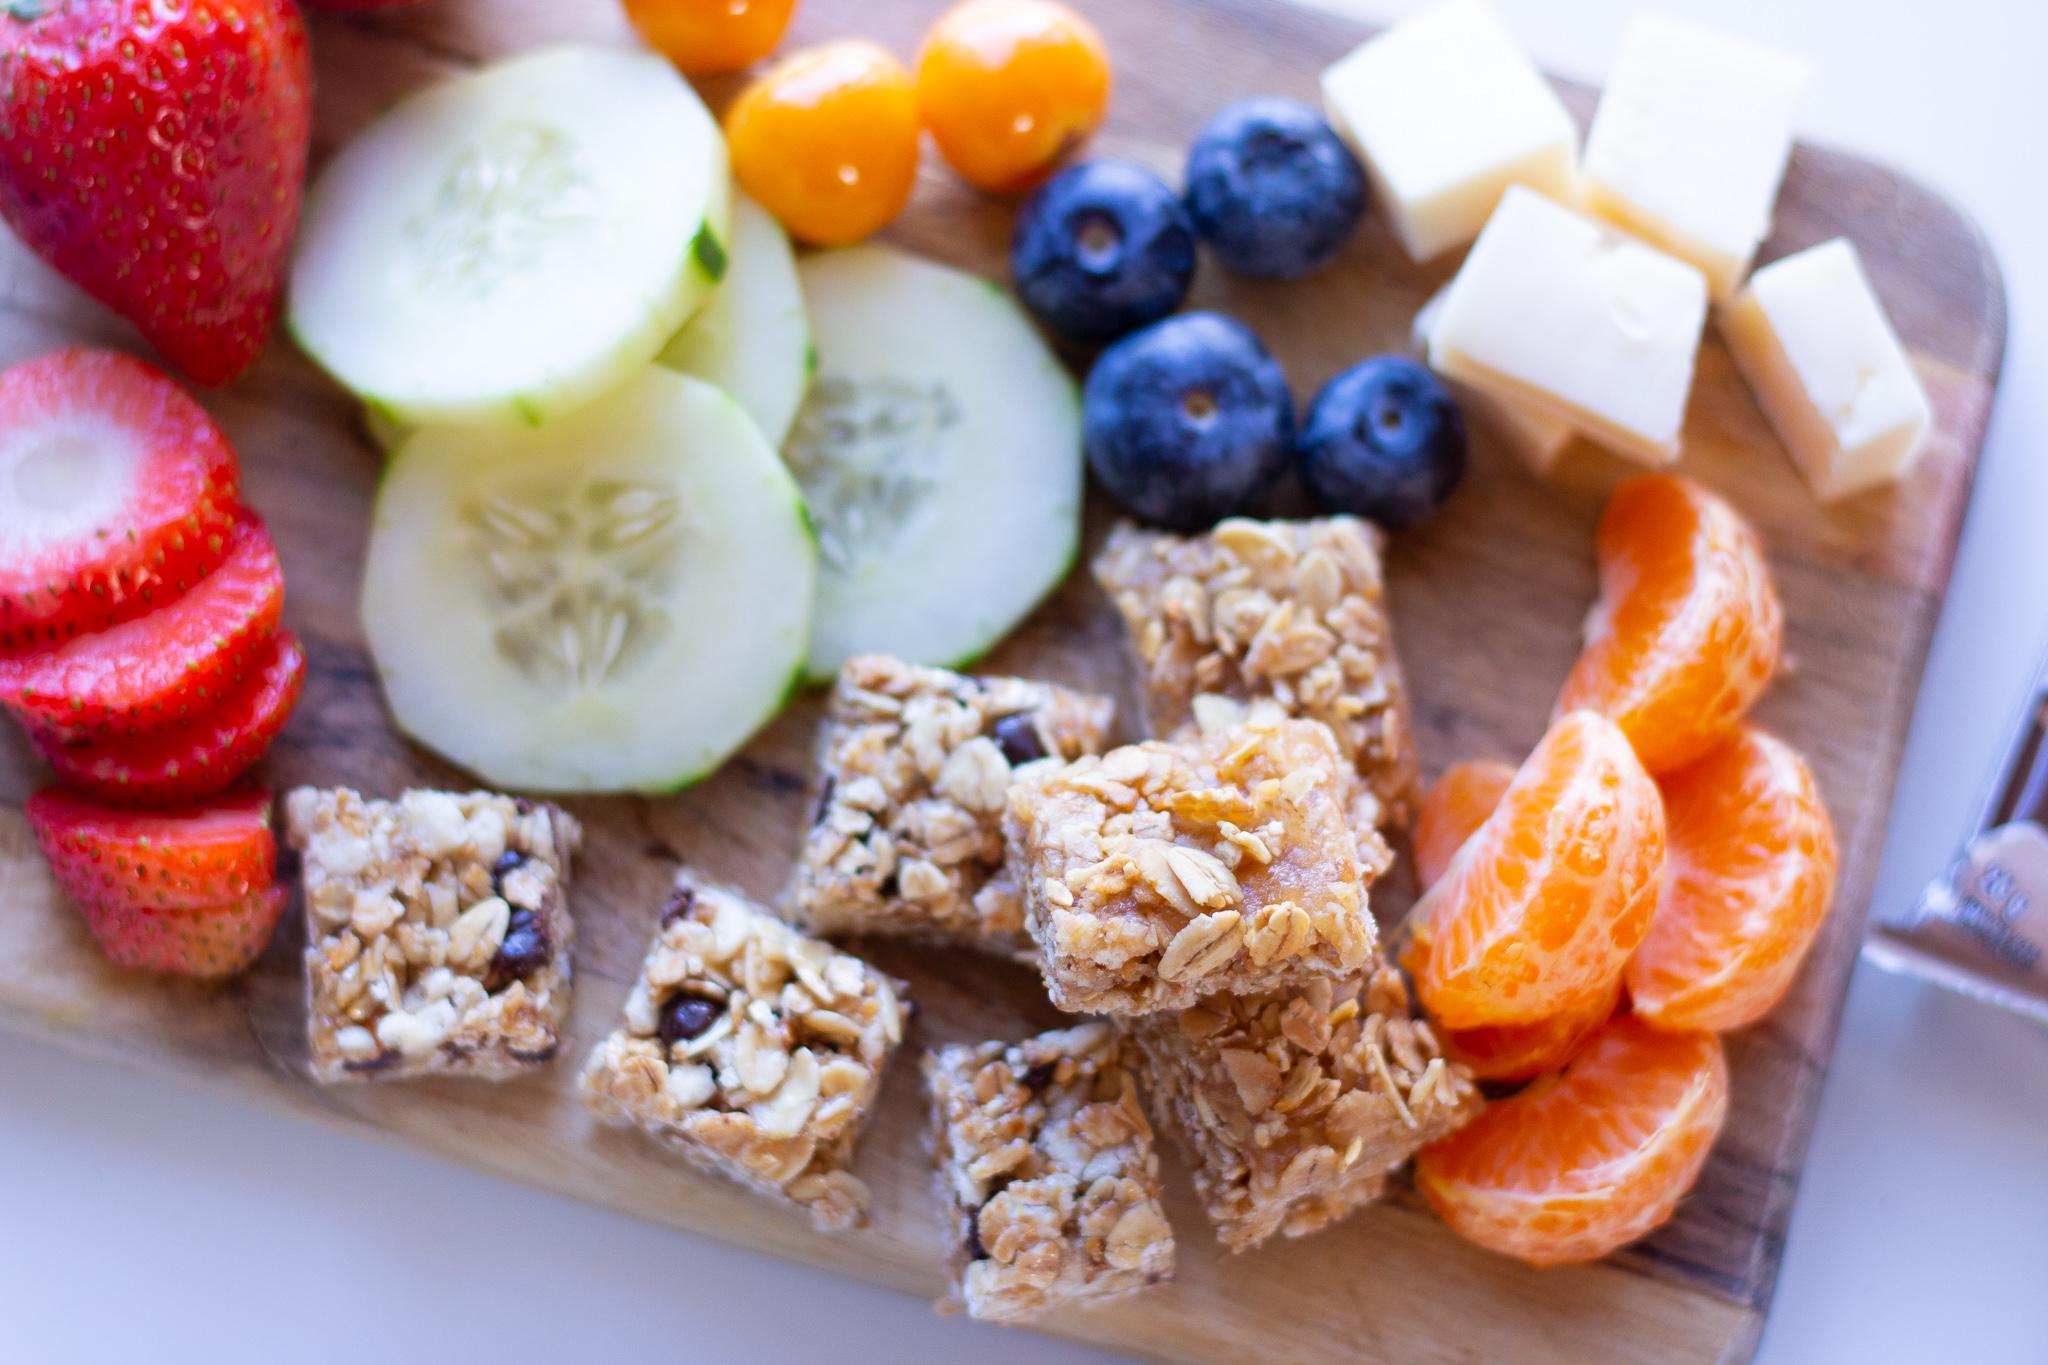 Snack board featuring Quaker Chewy granola bars